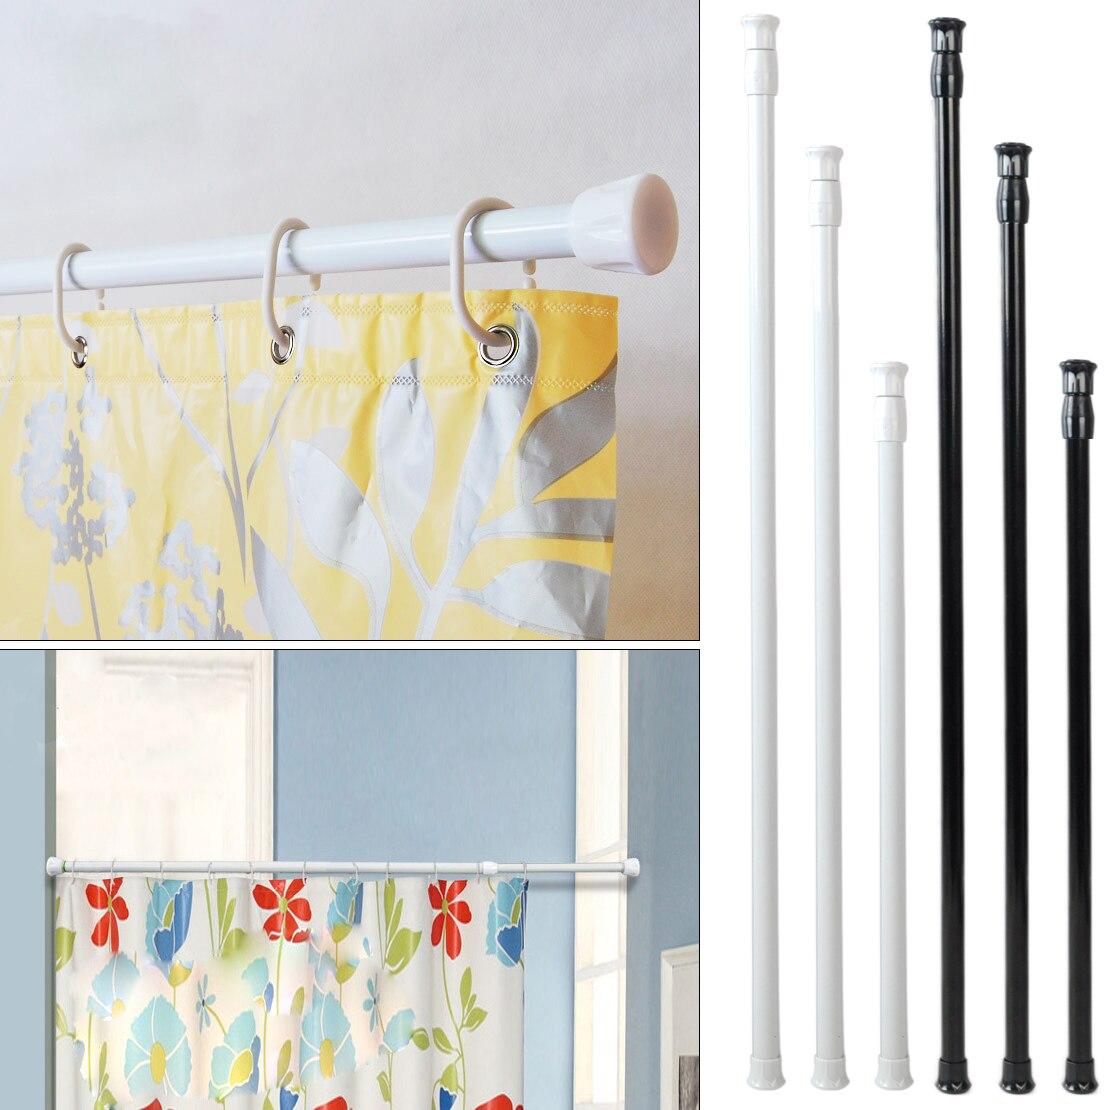 Extensible ajustable 40-70cm resorte cargado Barra de tensión poste colgador telescópico cortina ducha baño ventana productos